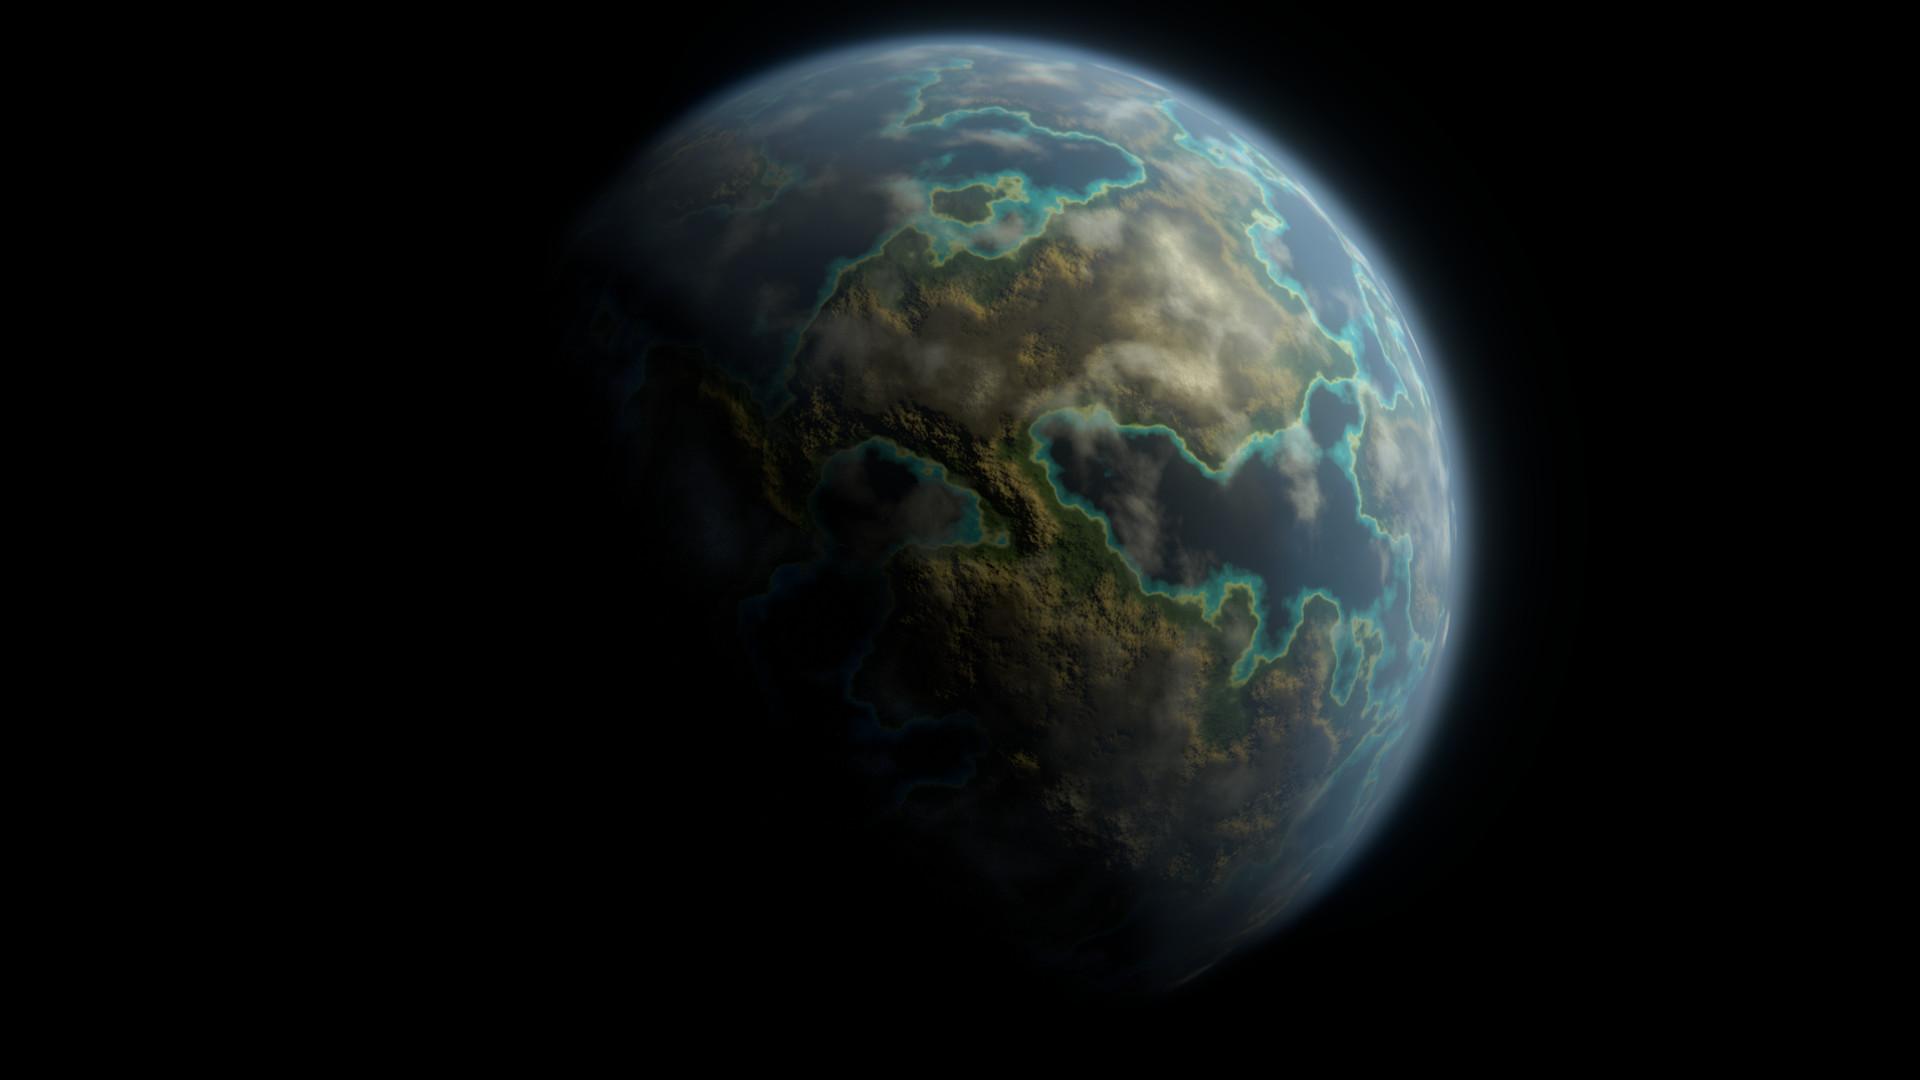 ArtStation - Blender procedural planet generator, Mario Dupuis